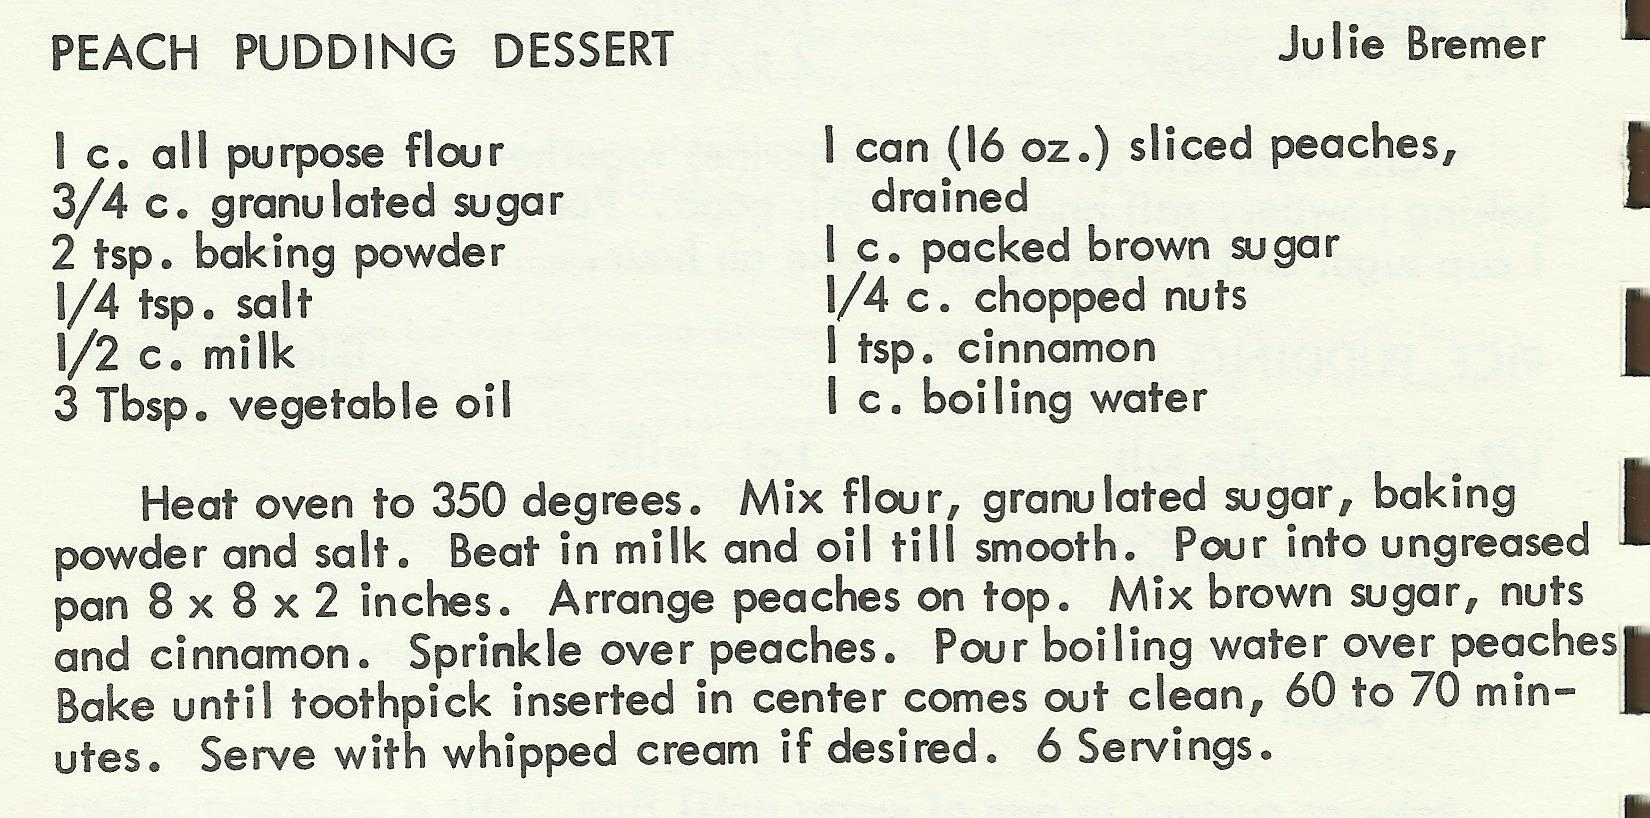 Peach Pudding Dessert